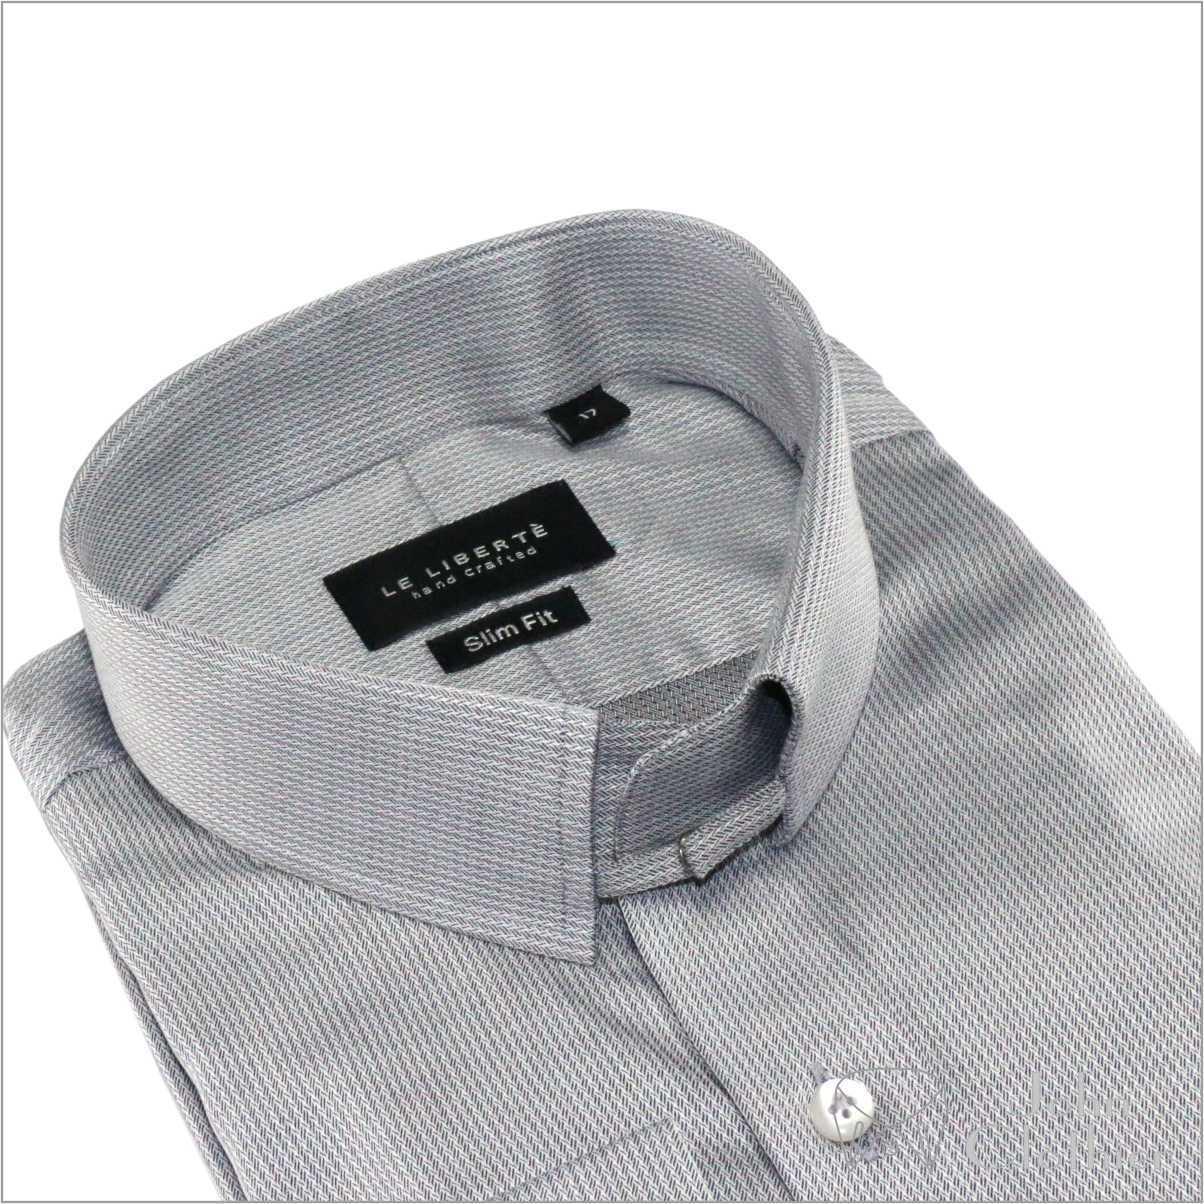 Tab collar shirts Jermyn Street Work wear Geschäft Formal James Bond Loop collar